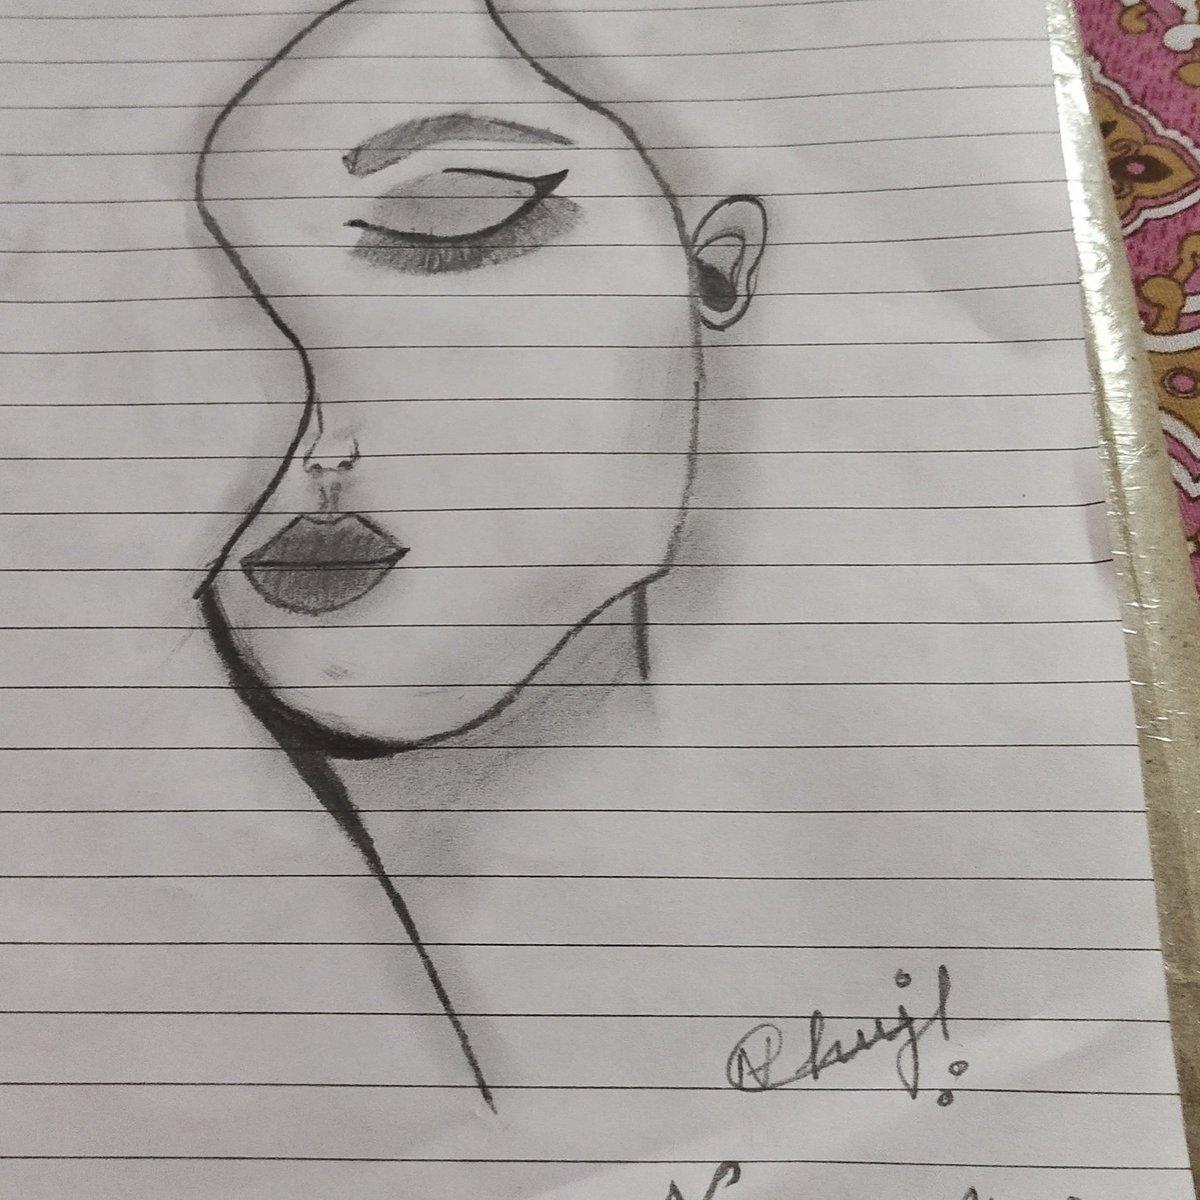 My Daughters first sketch   #Sketch pic.twitter.com/cv8cIjd7ec